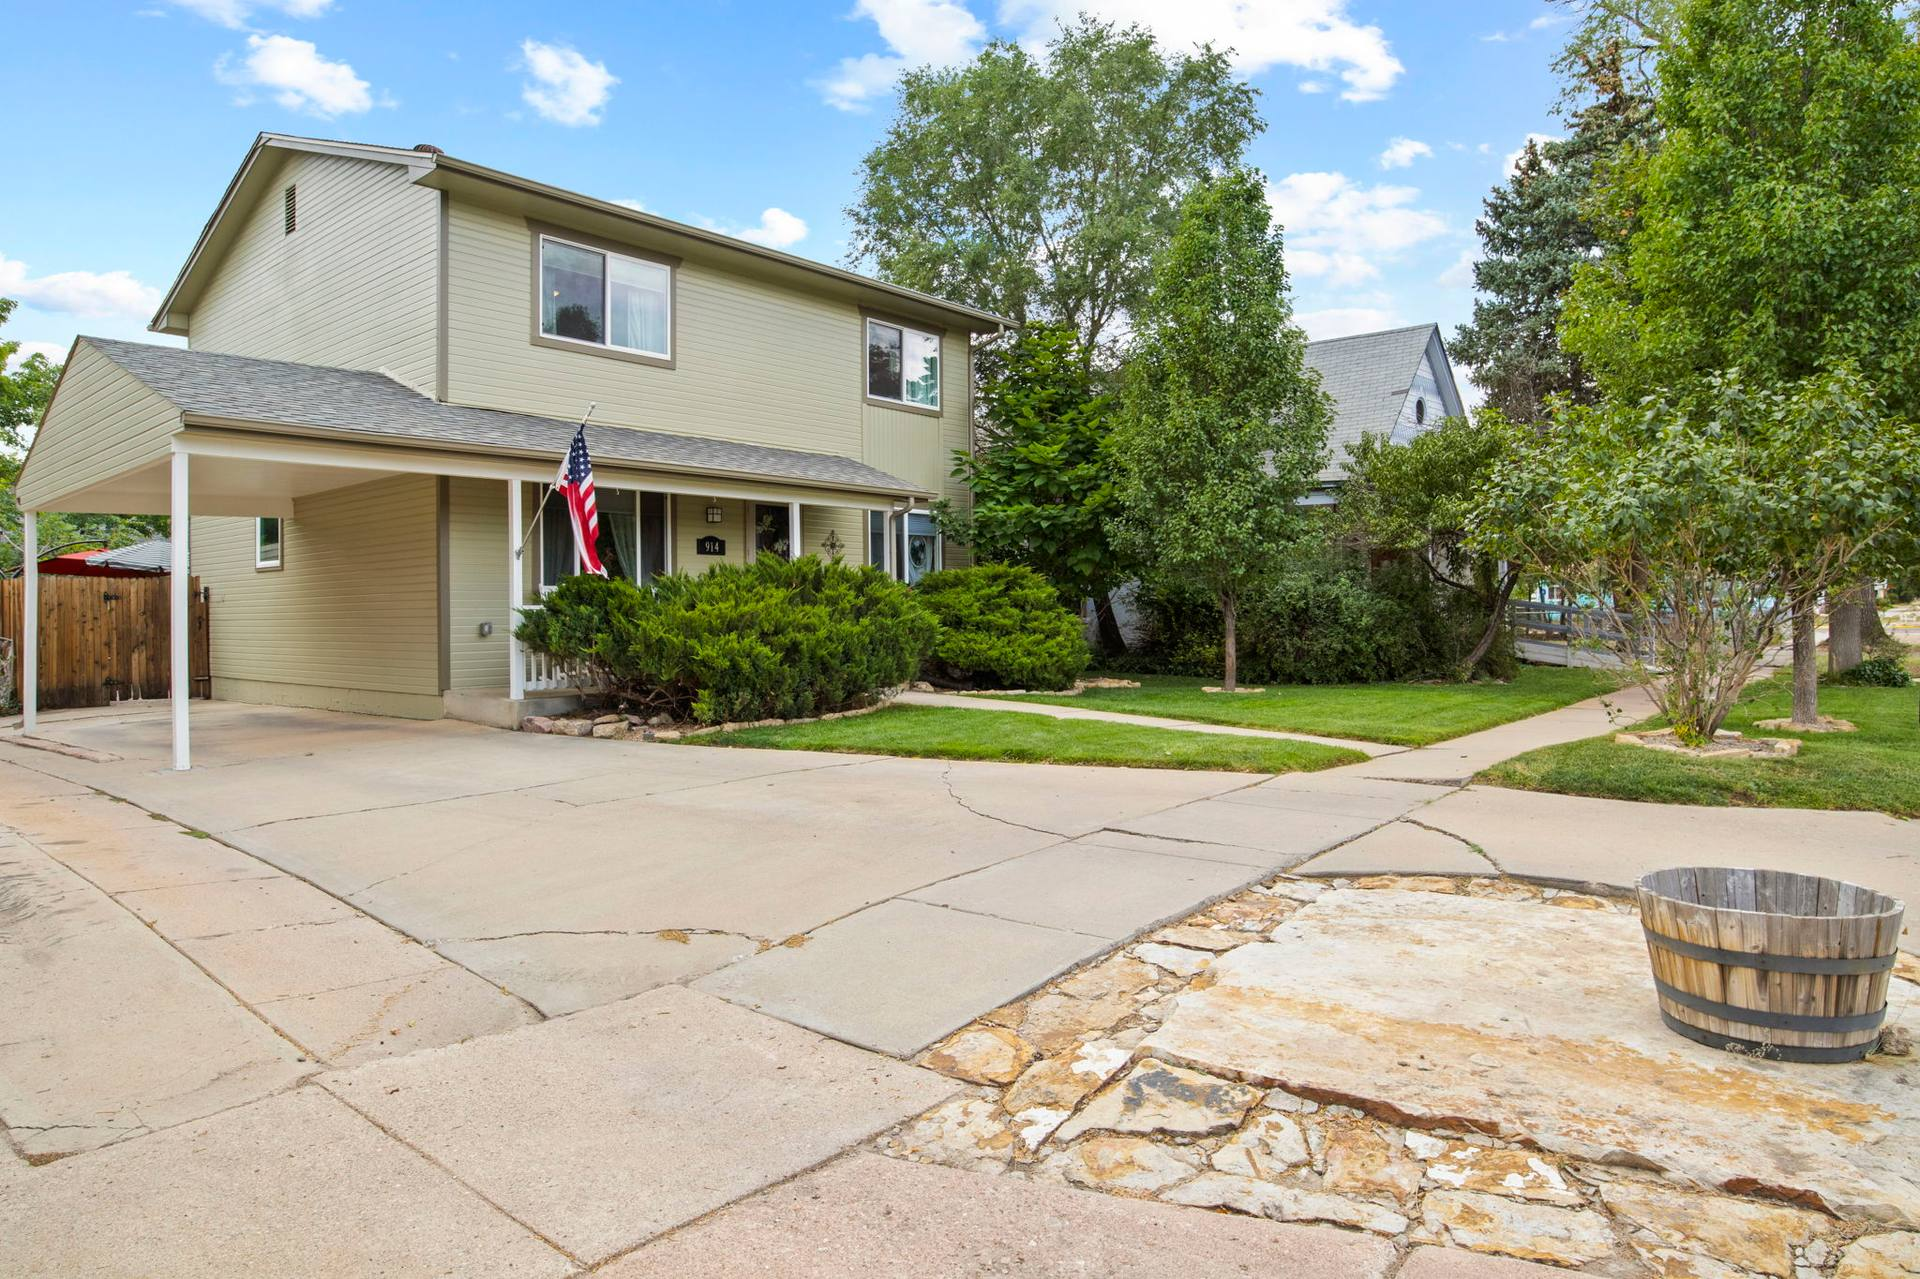 914 College Ave, Cañon City, CO 81212, USA